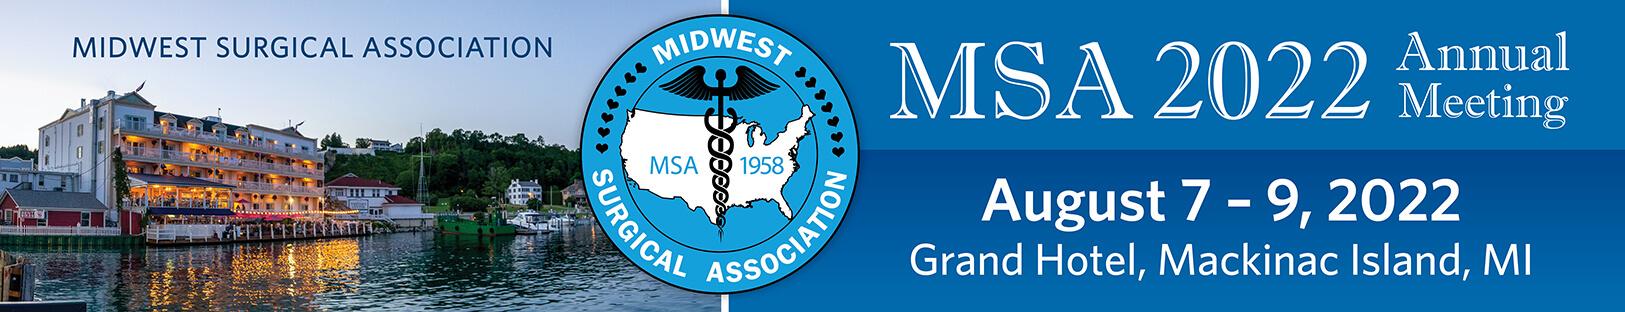 MSA 2022 Banner